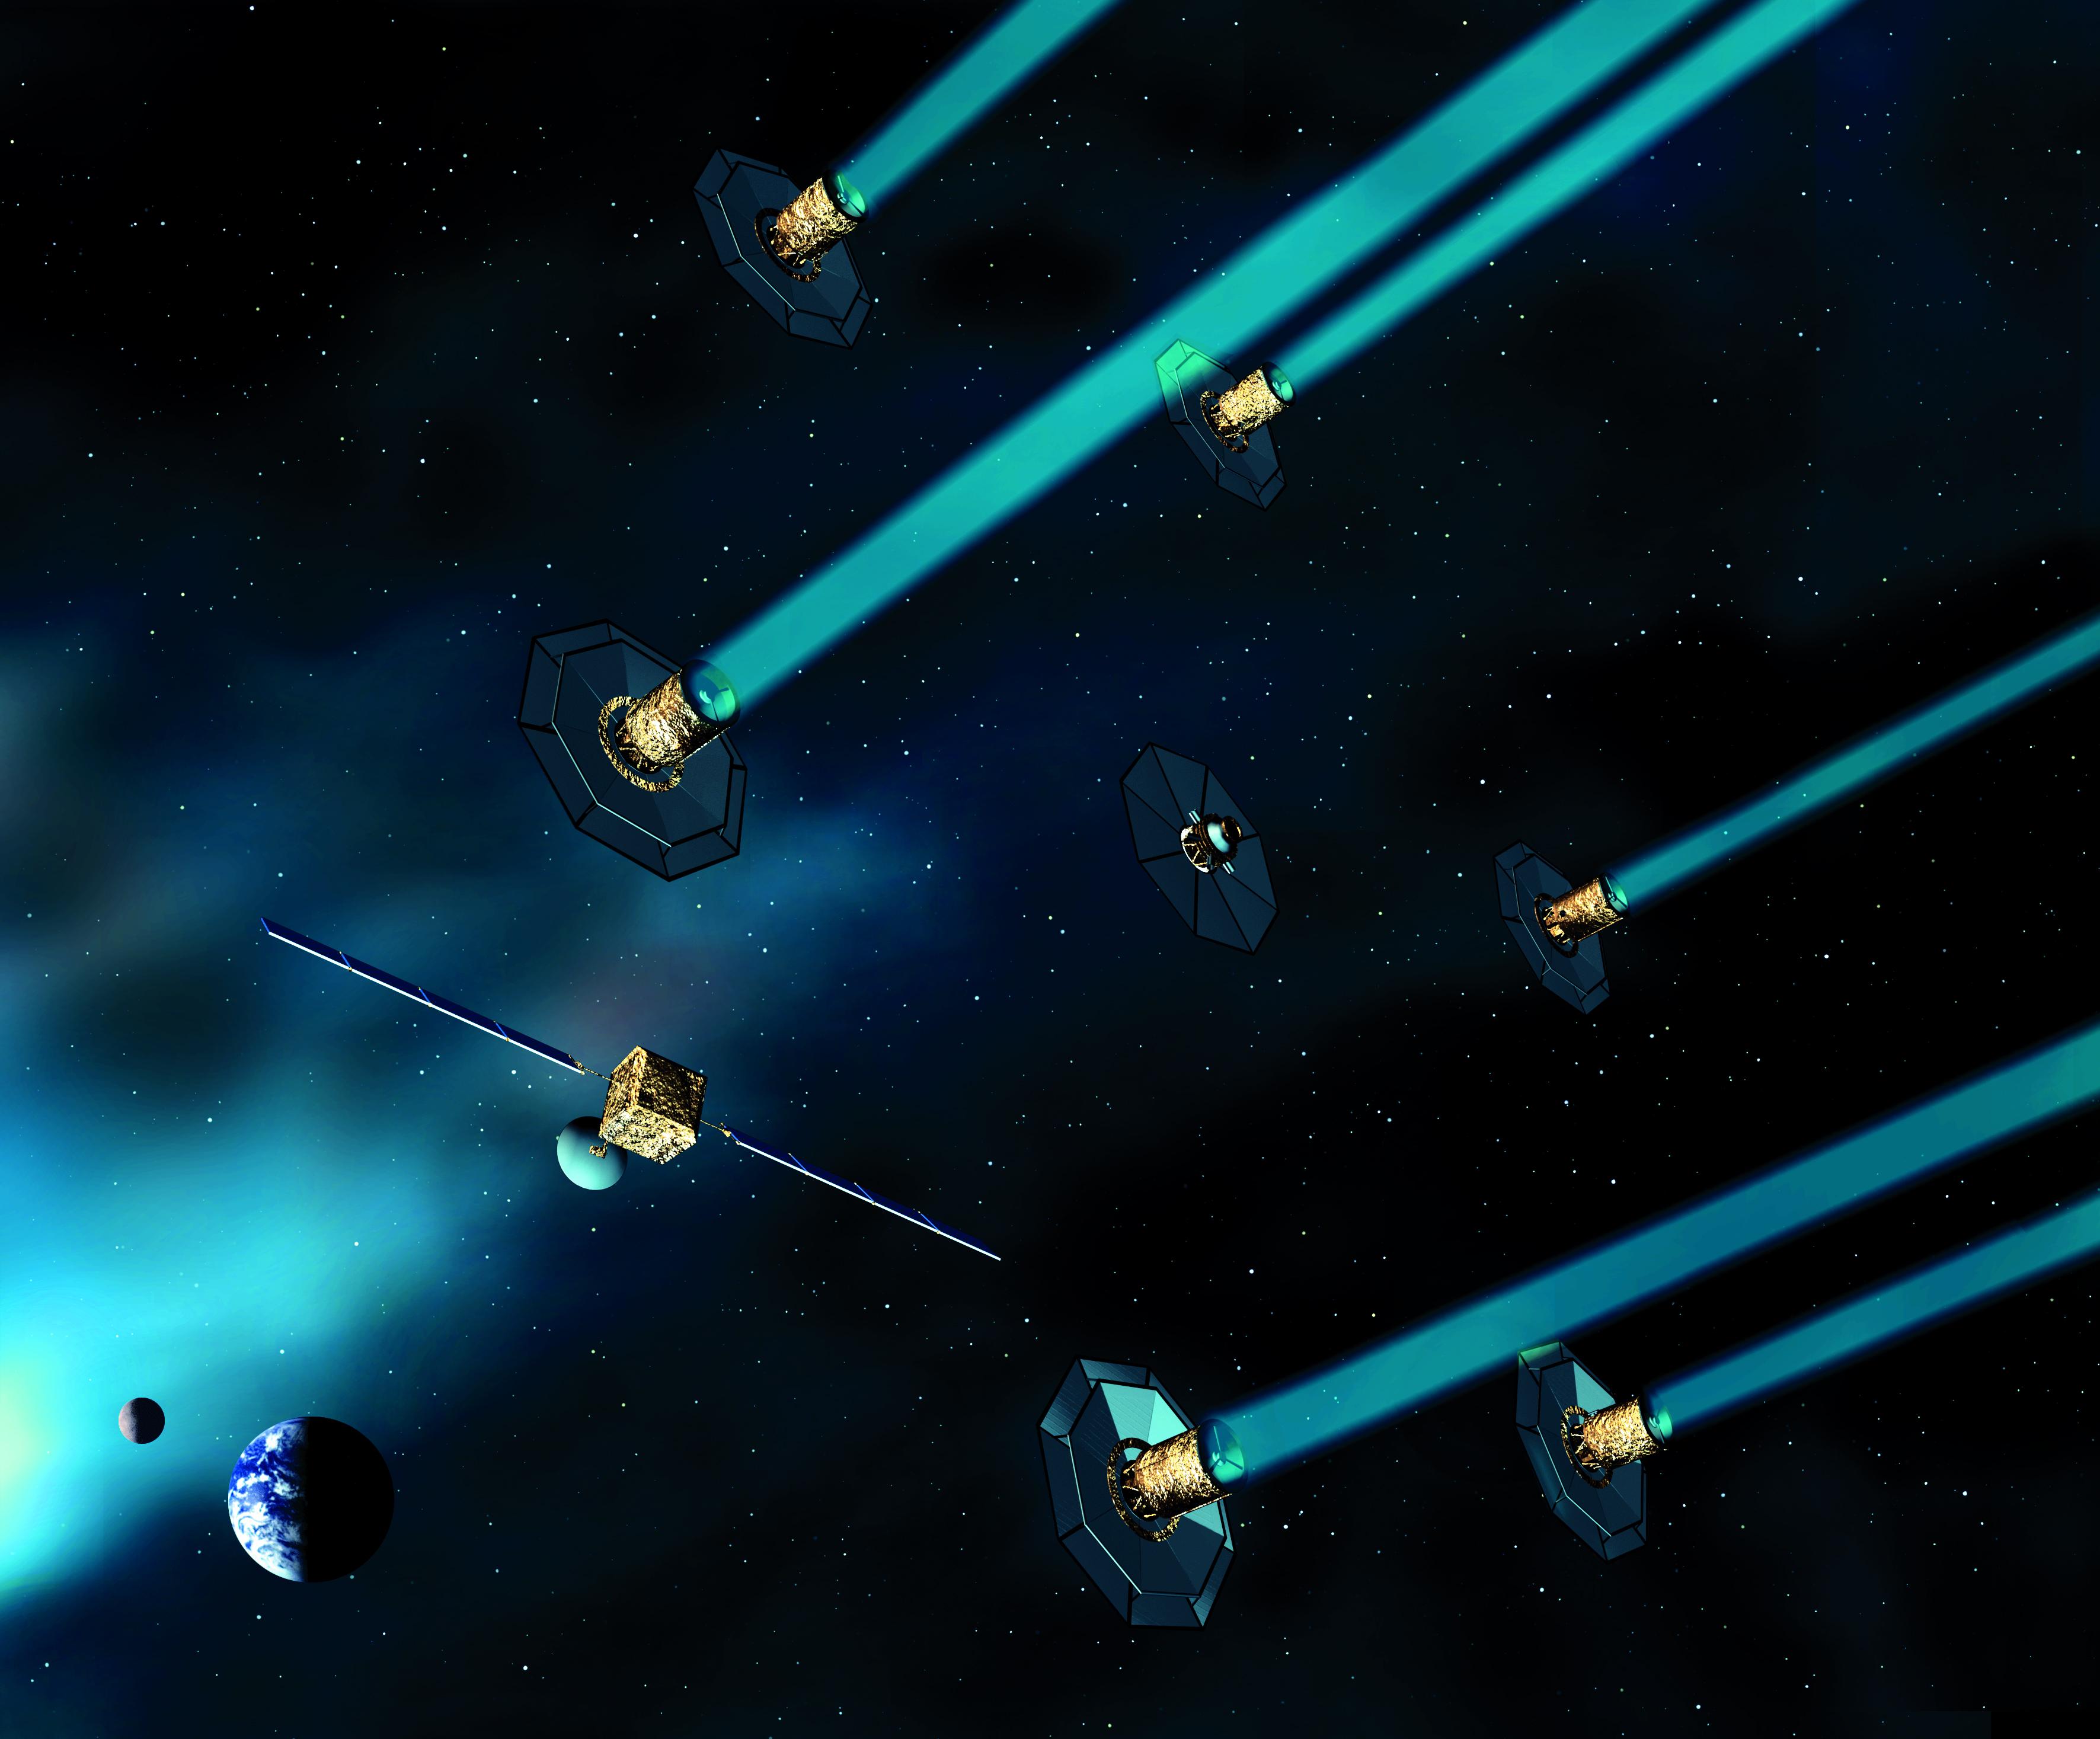 Darwin_s_six_telescopes